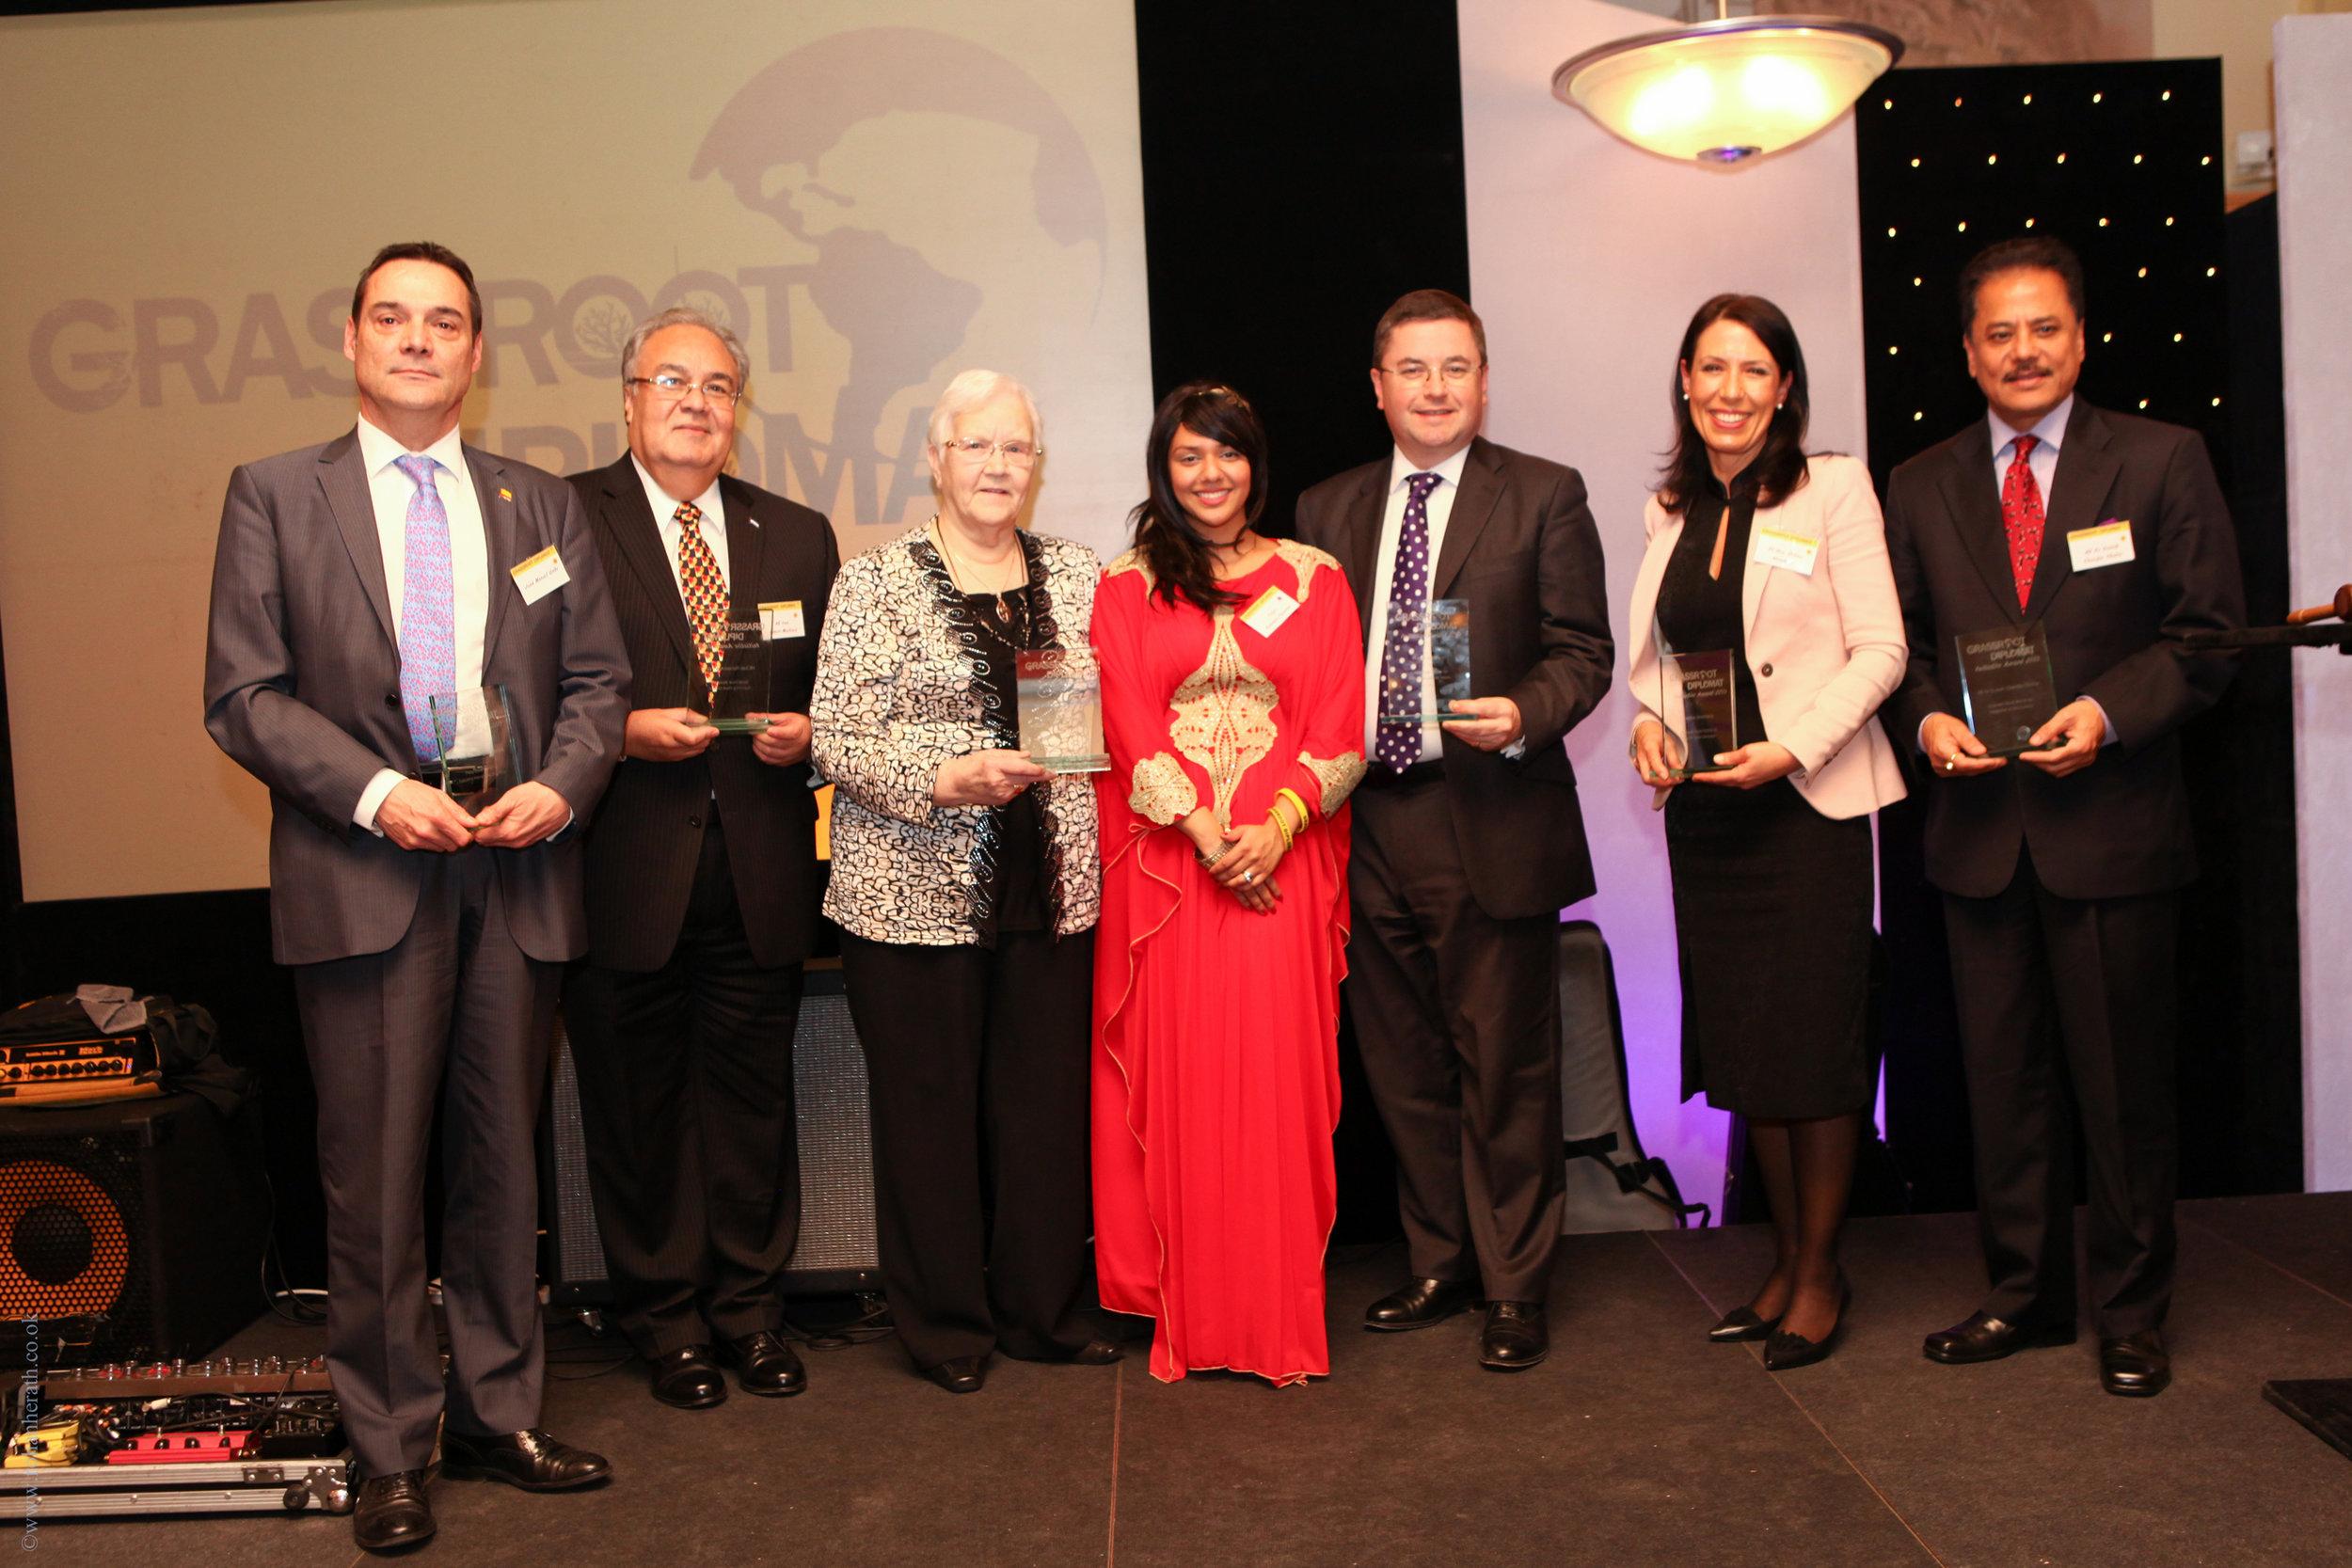 Winners of the Grassroot Diplomat Award 2013